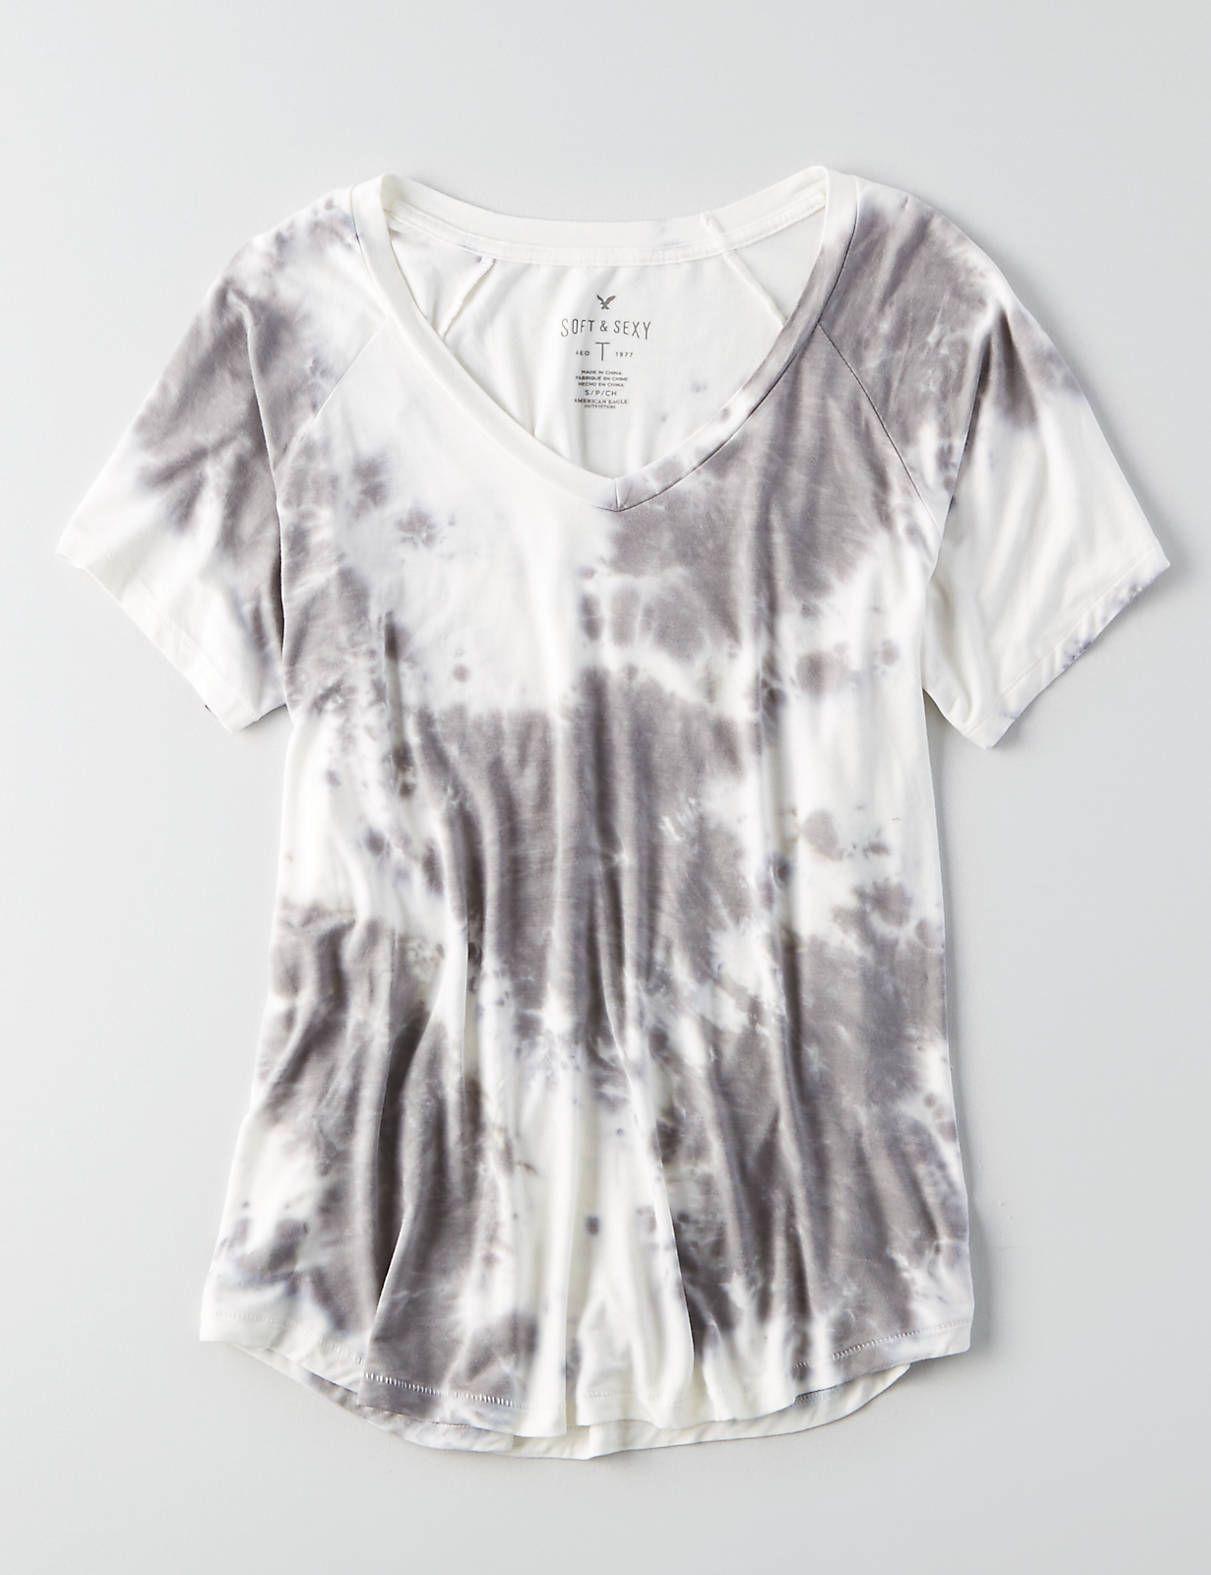 AEO Soft & Sexy V-Neck Favorite Tie-Dye T-Shirt | Silhouettes ...